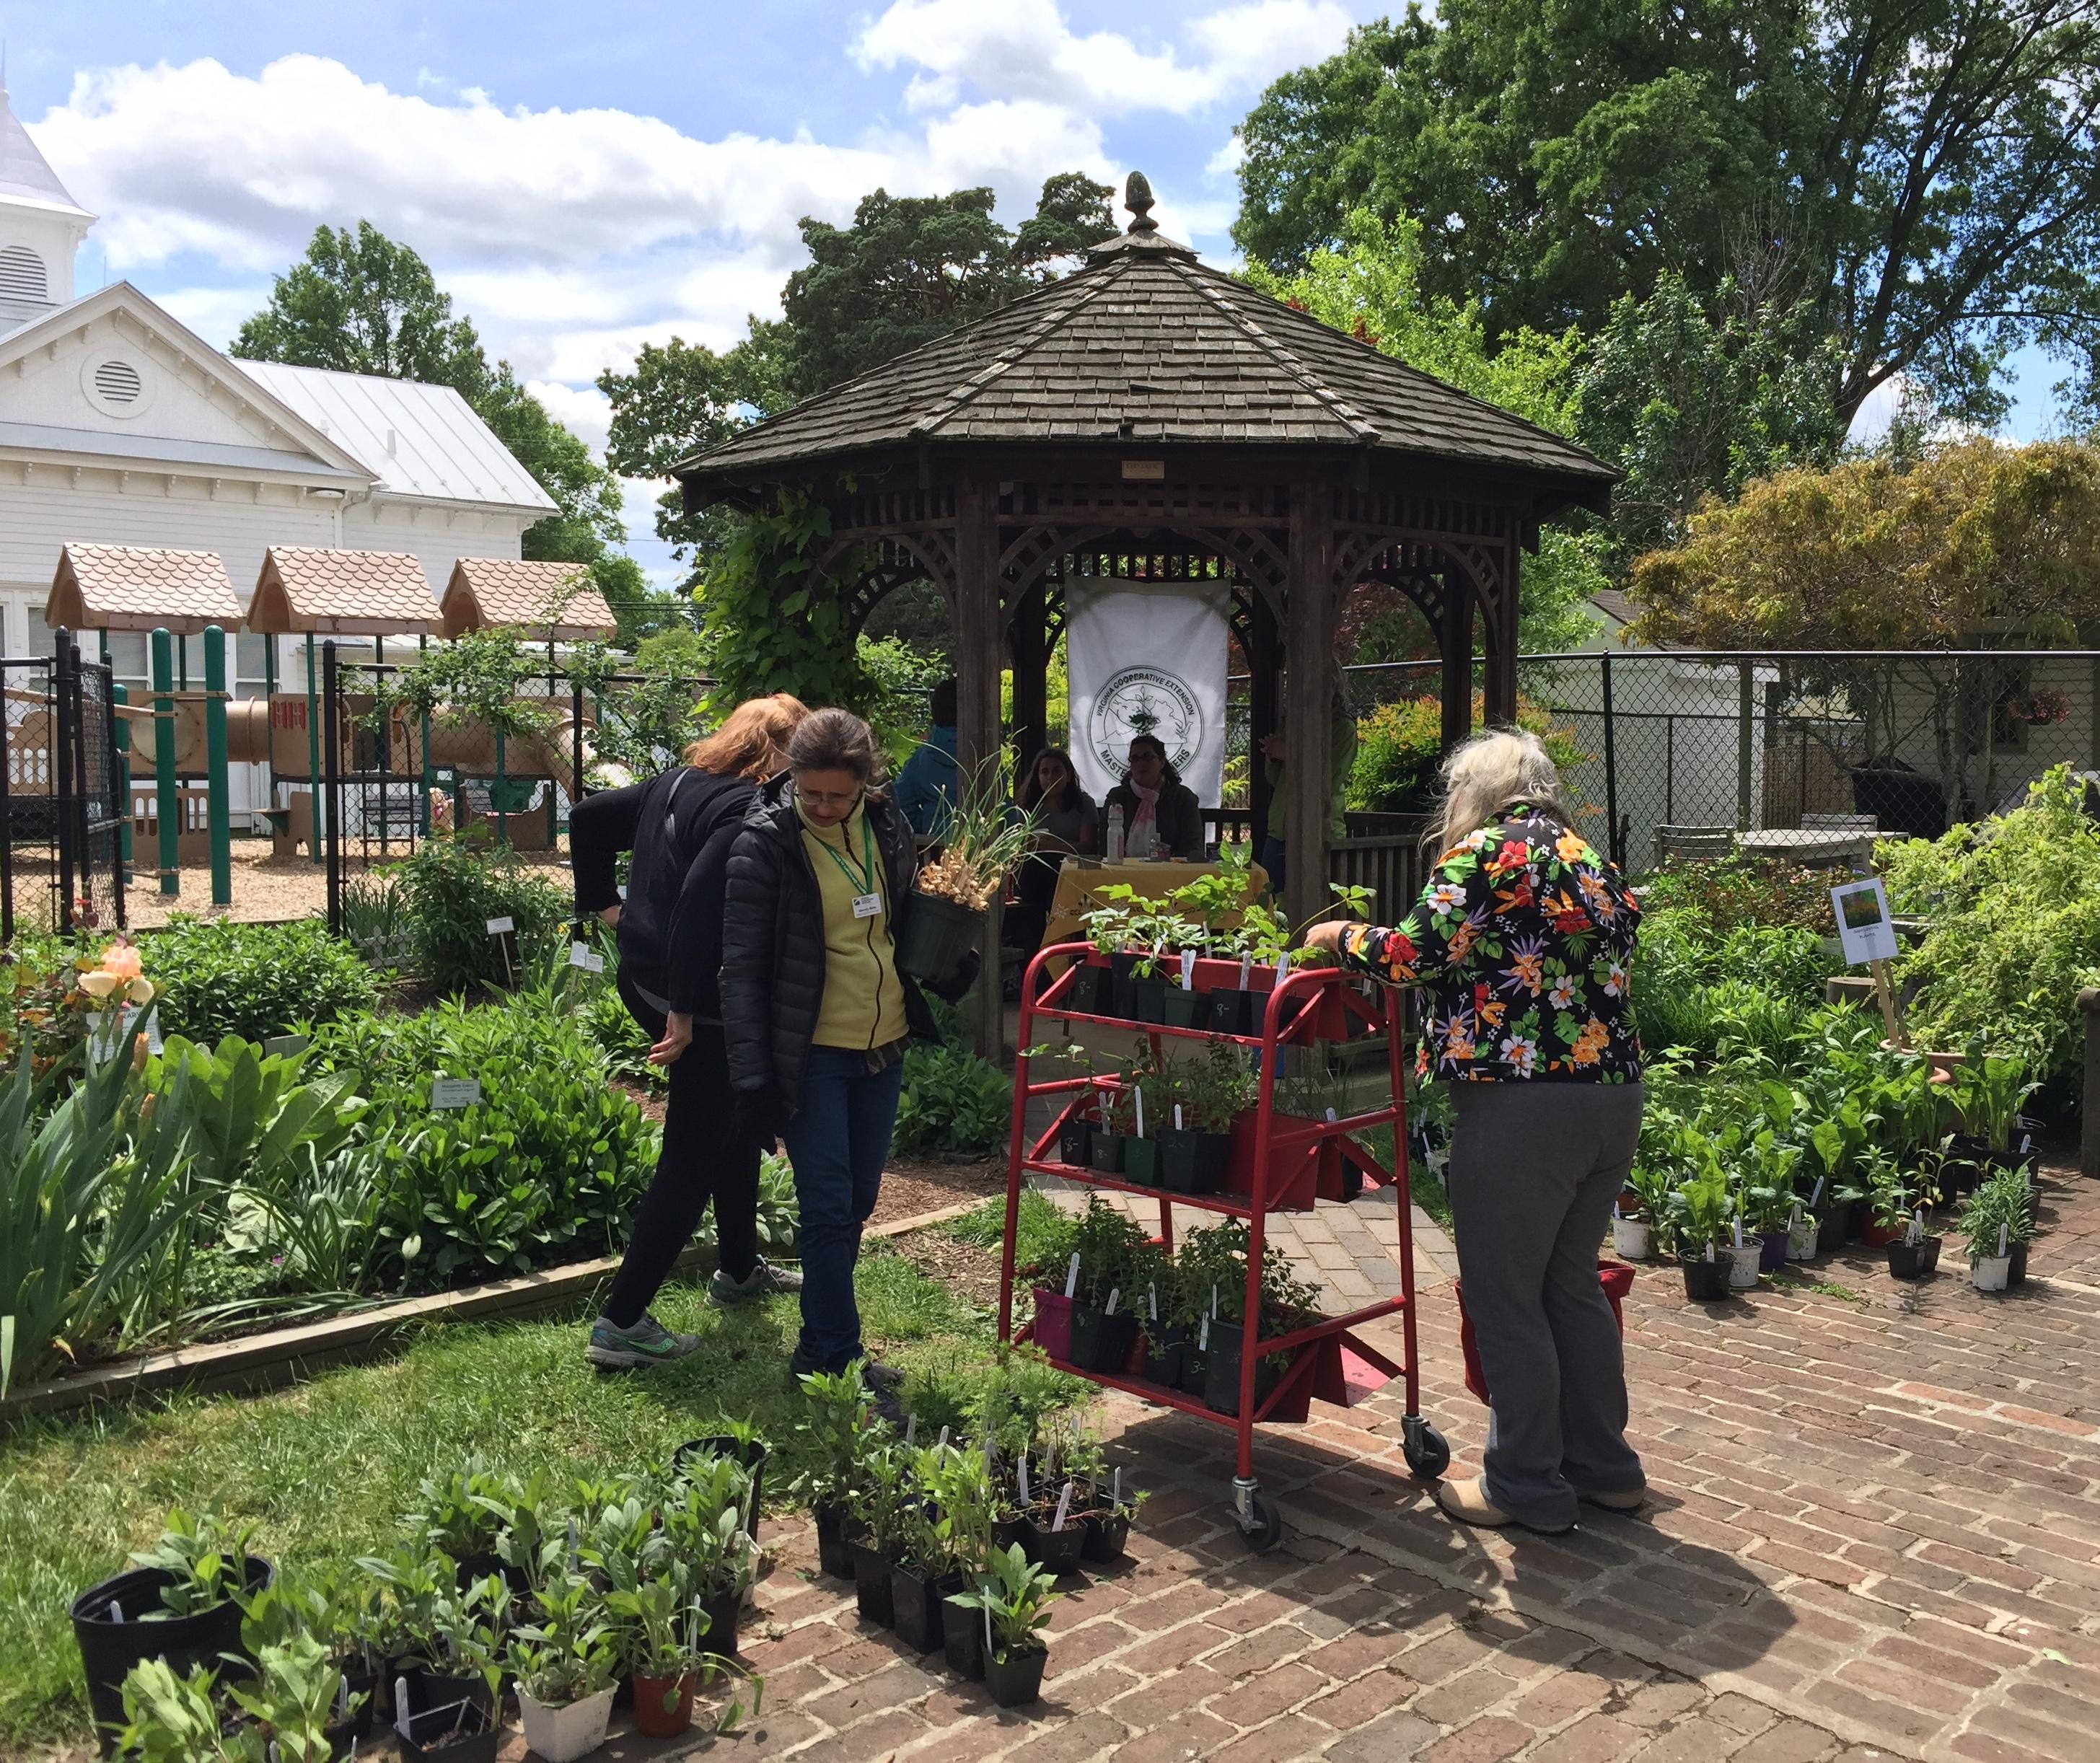 Quarry Shade Garden At Bon Air Park: Meet The Glencarlyn Library Community Garden Coordinators